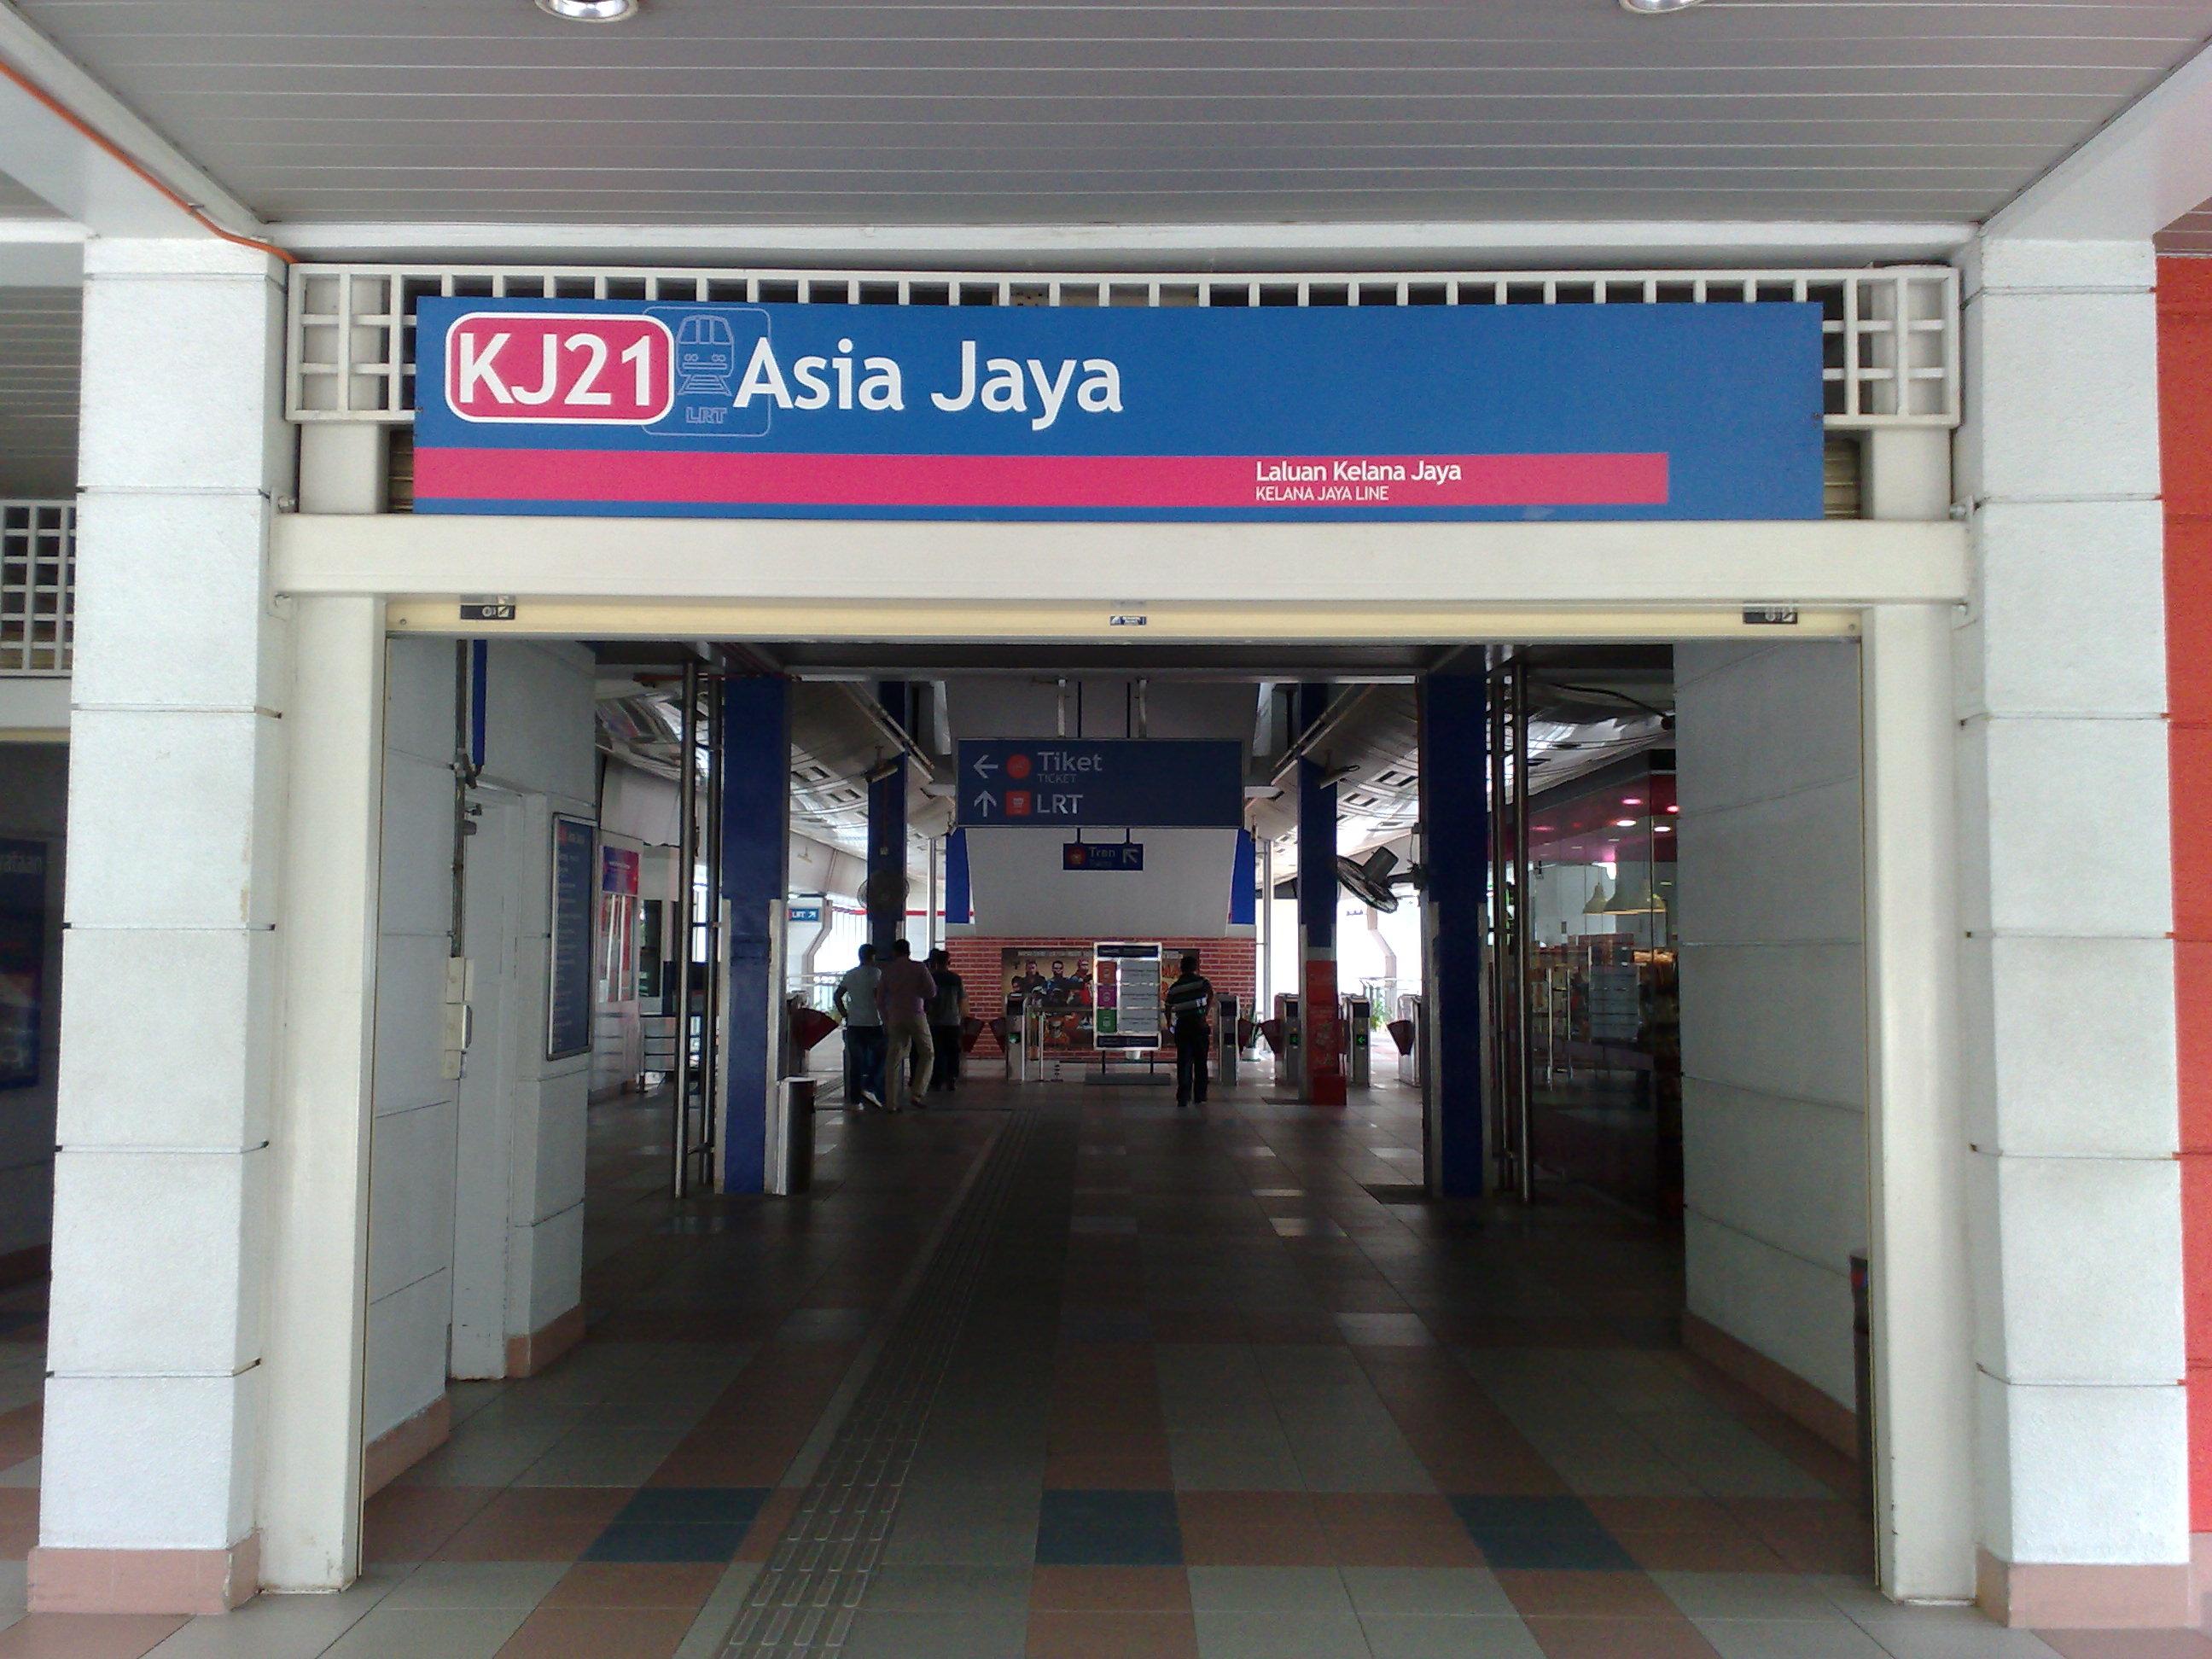 Fileasia Jaya Lrt Entrance Jpg